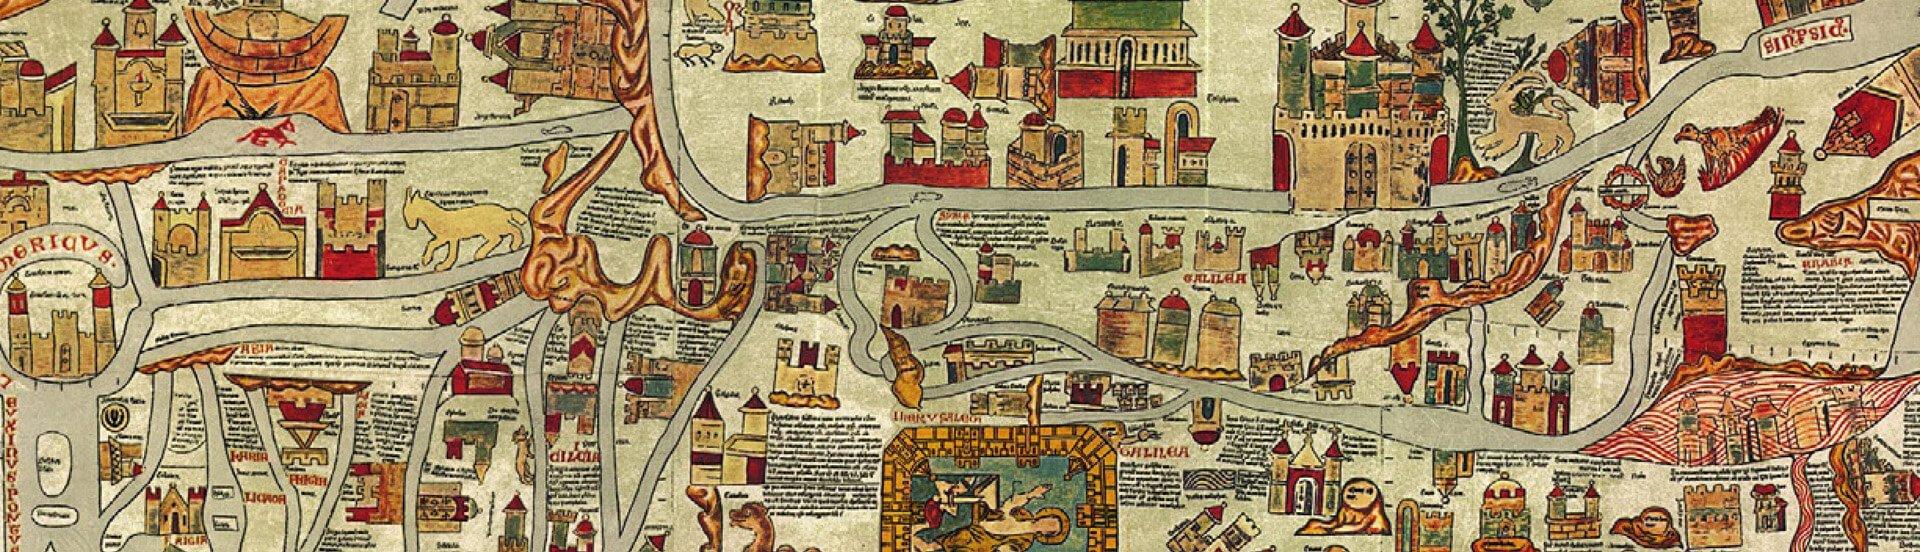 Ebstorfer Weltkarte, 1300